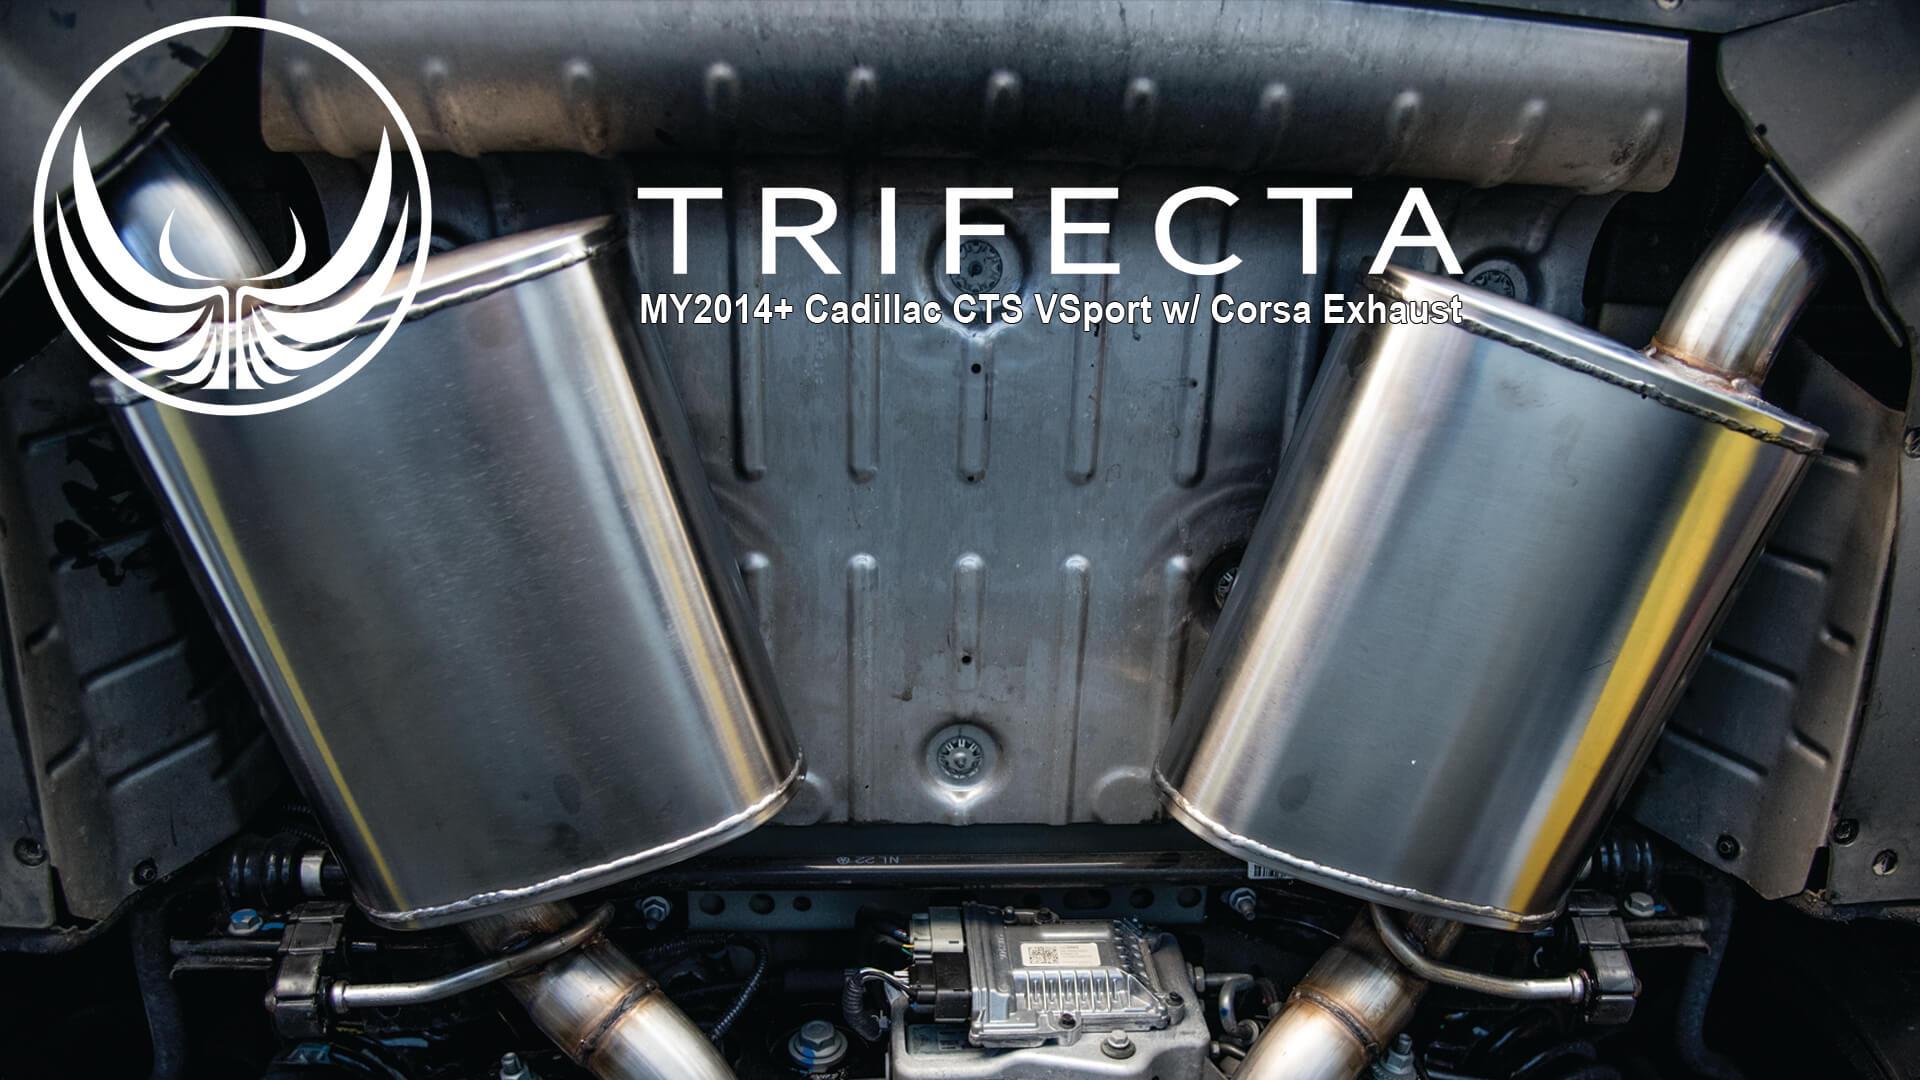 trifecta 2014 cts vsport corsa